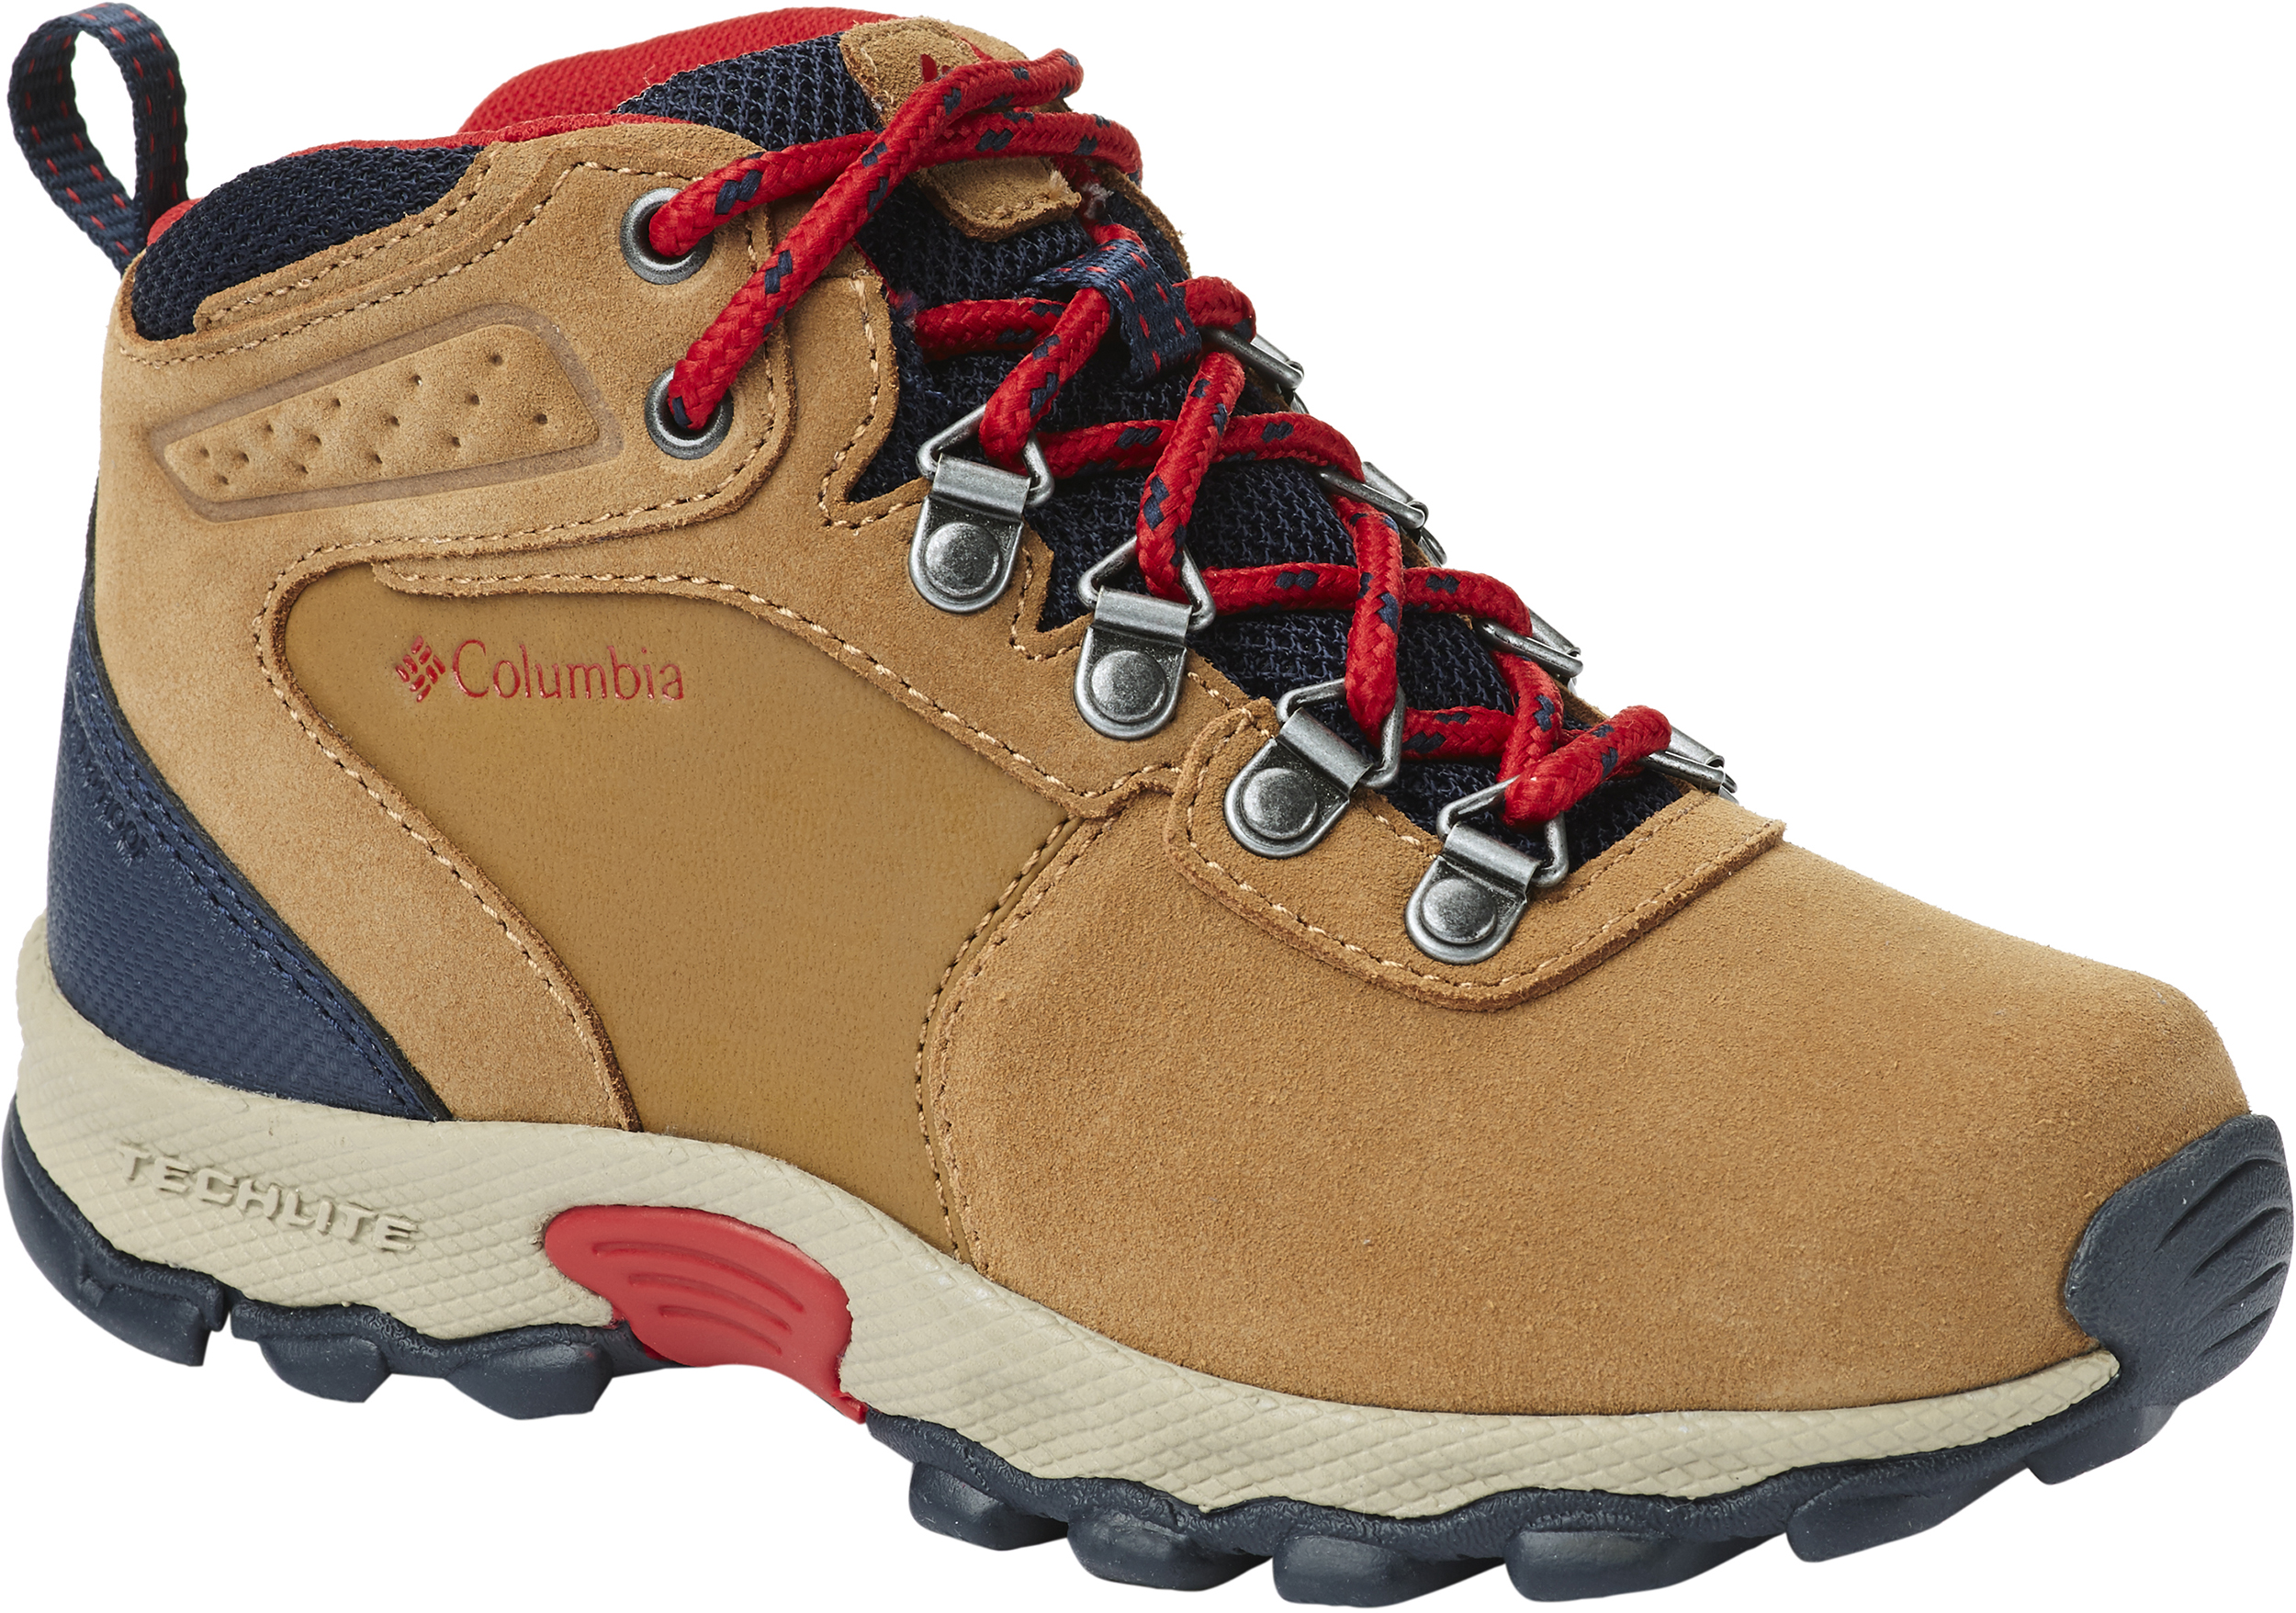 Columbia Newton Ridge Suede Boots